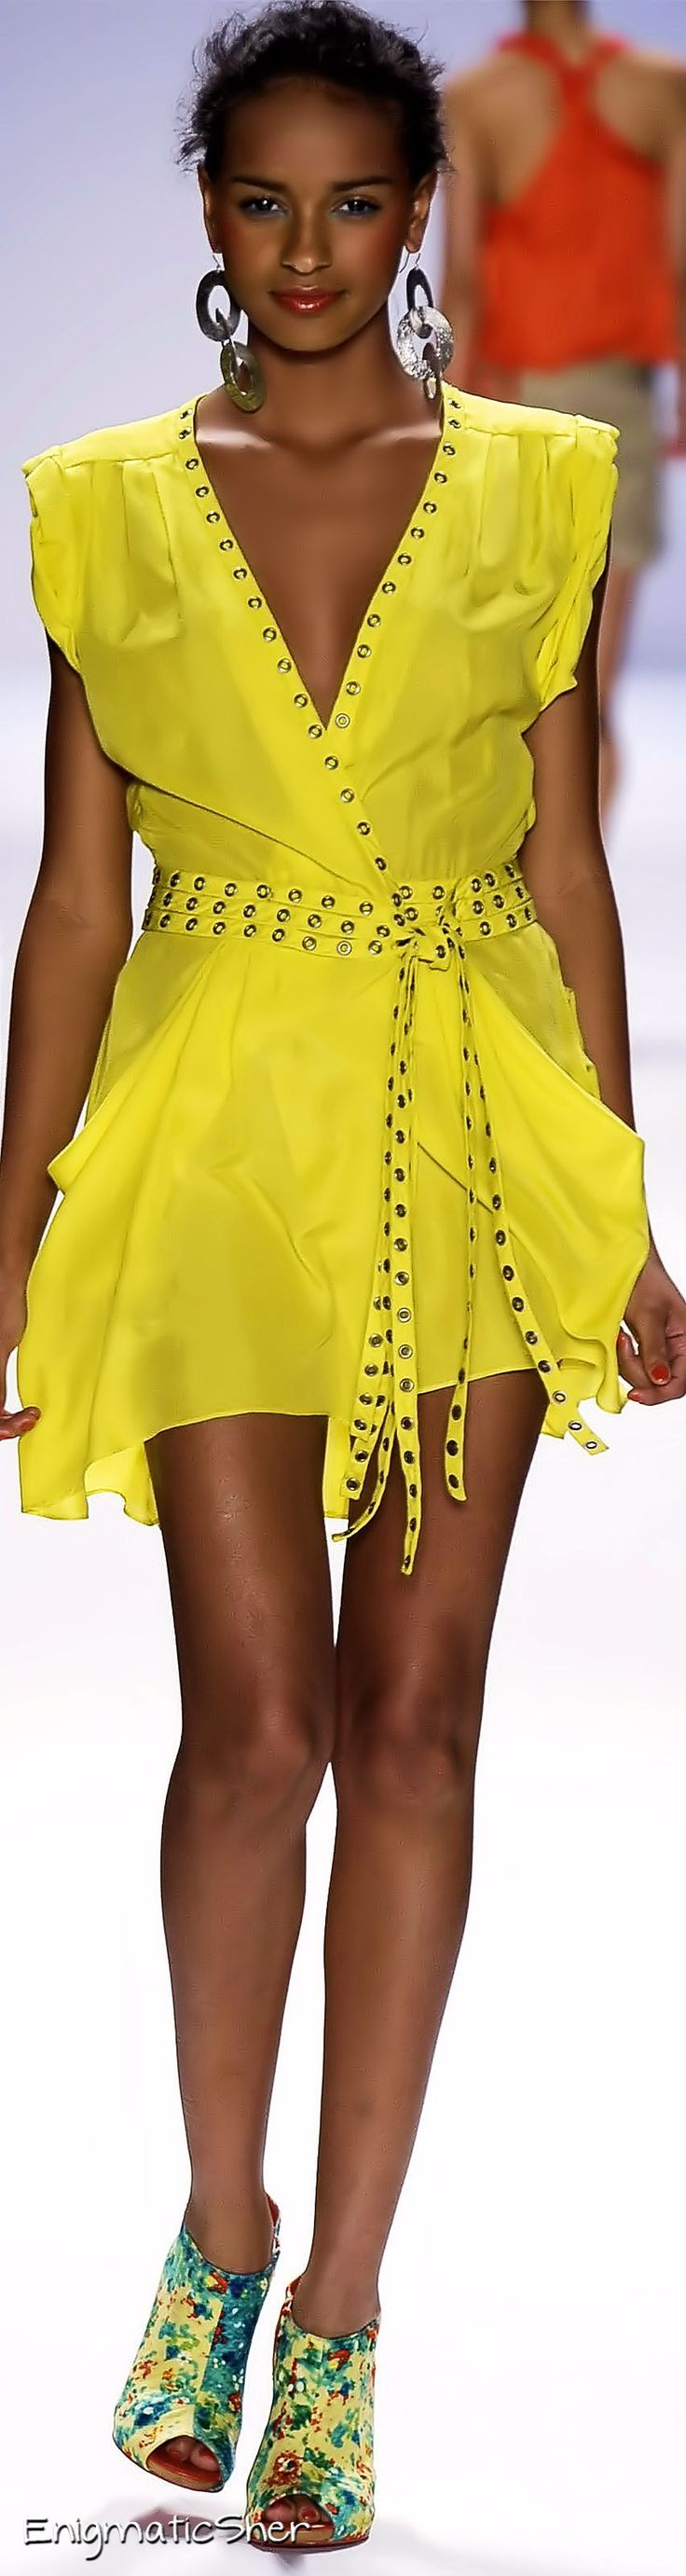 Nanette Lepore Spring Summer 2010 Ready-To-Wear